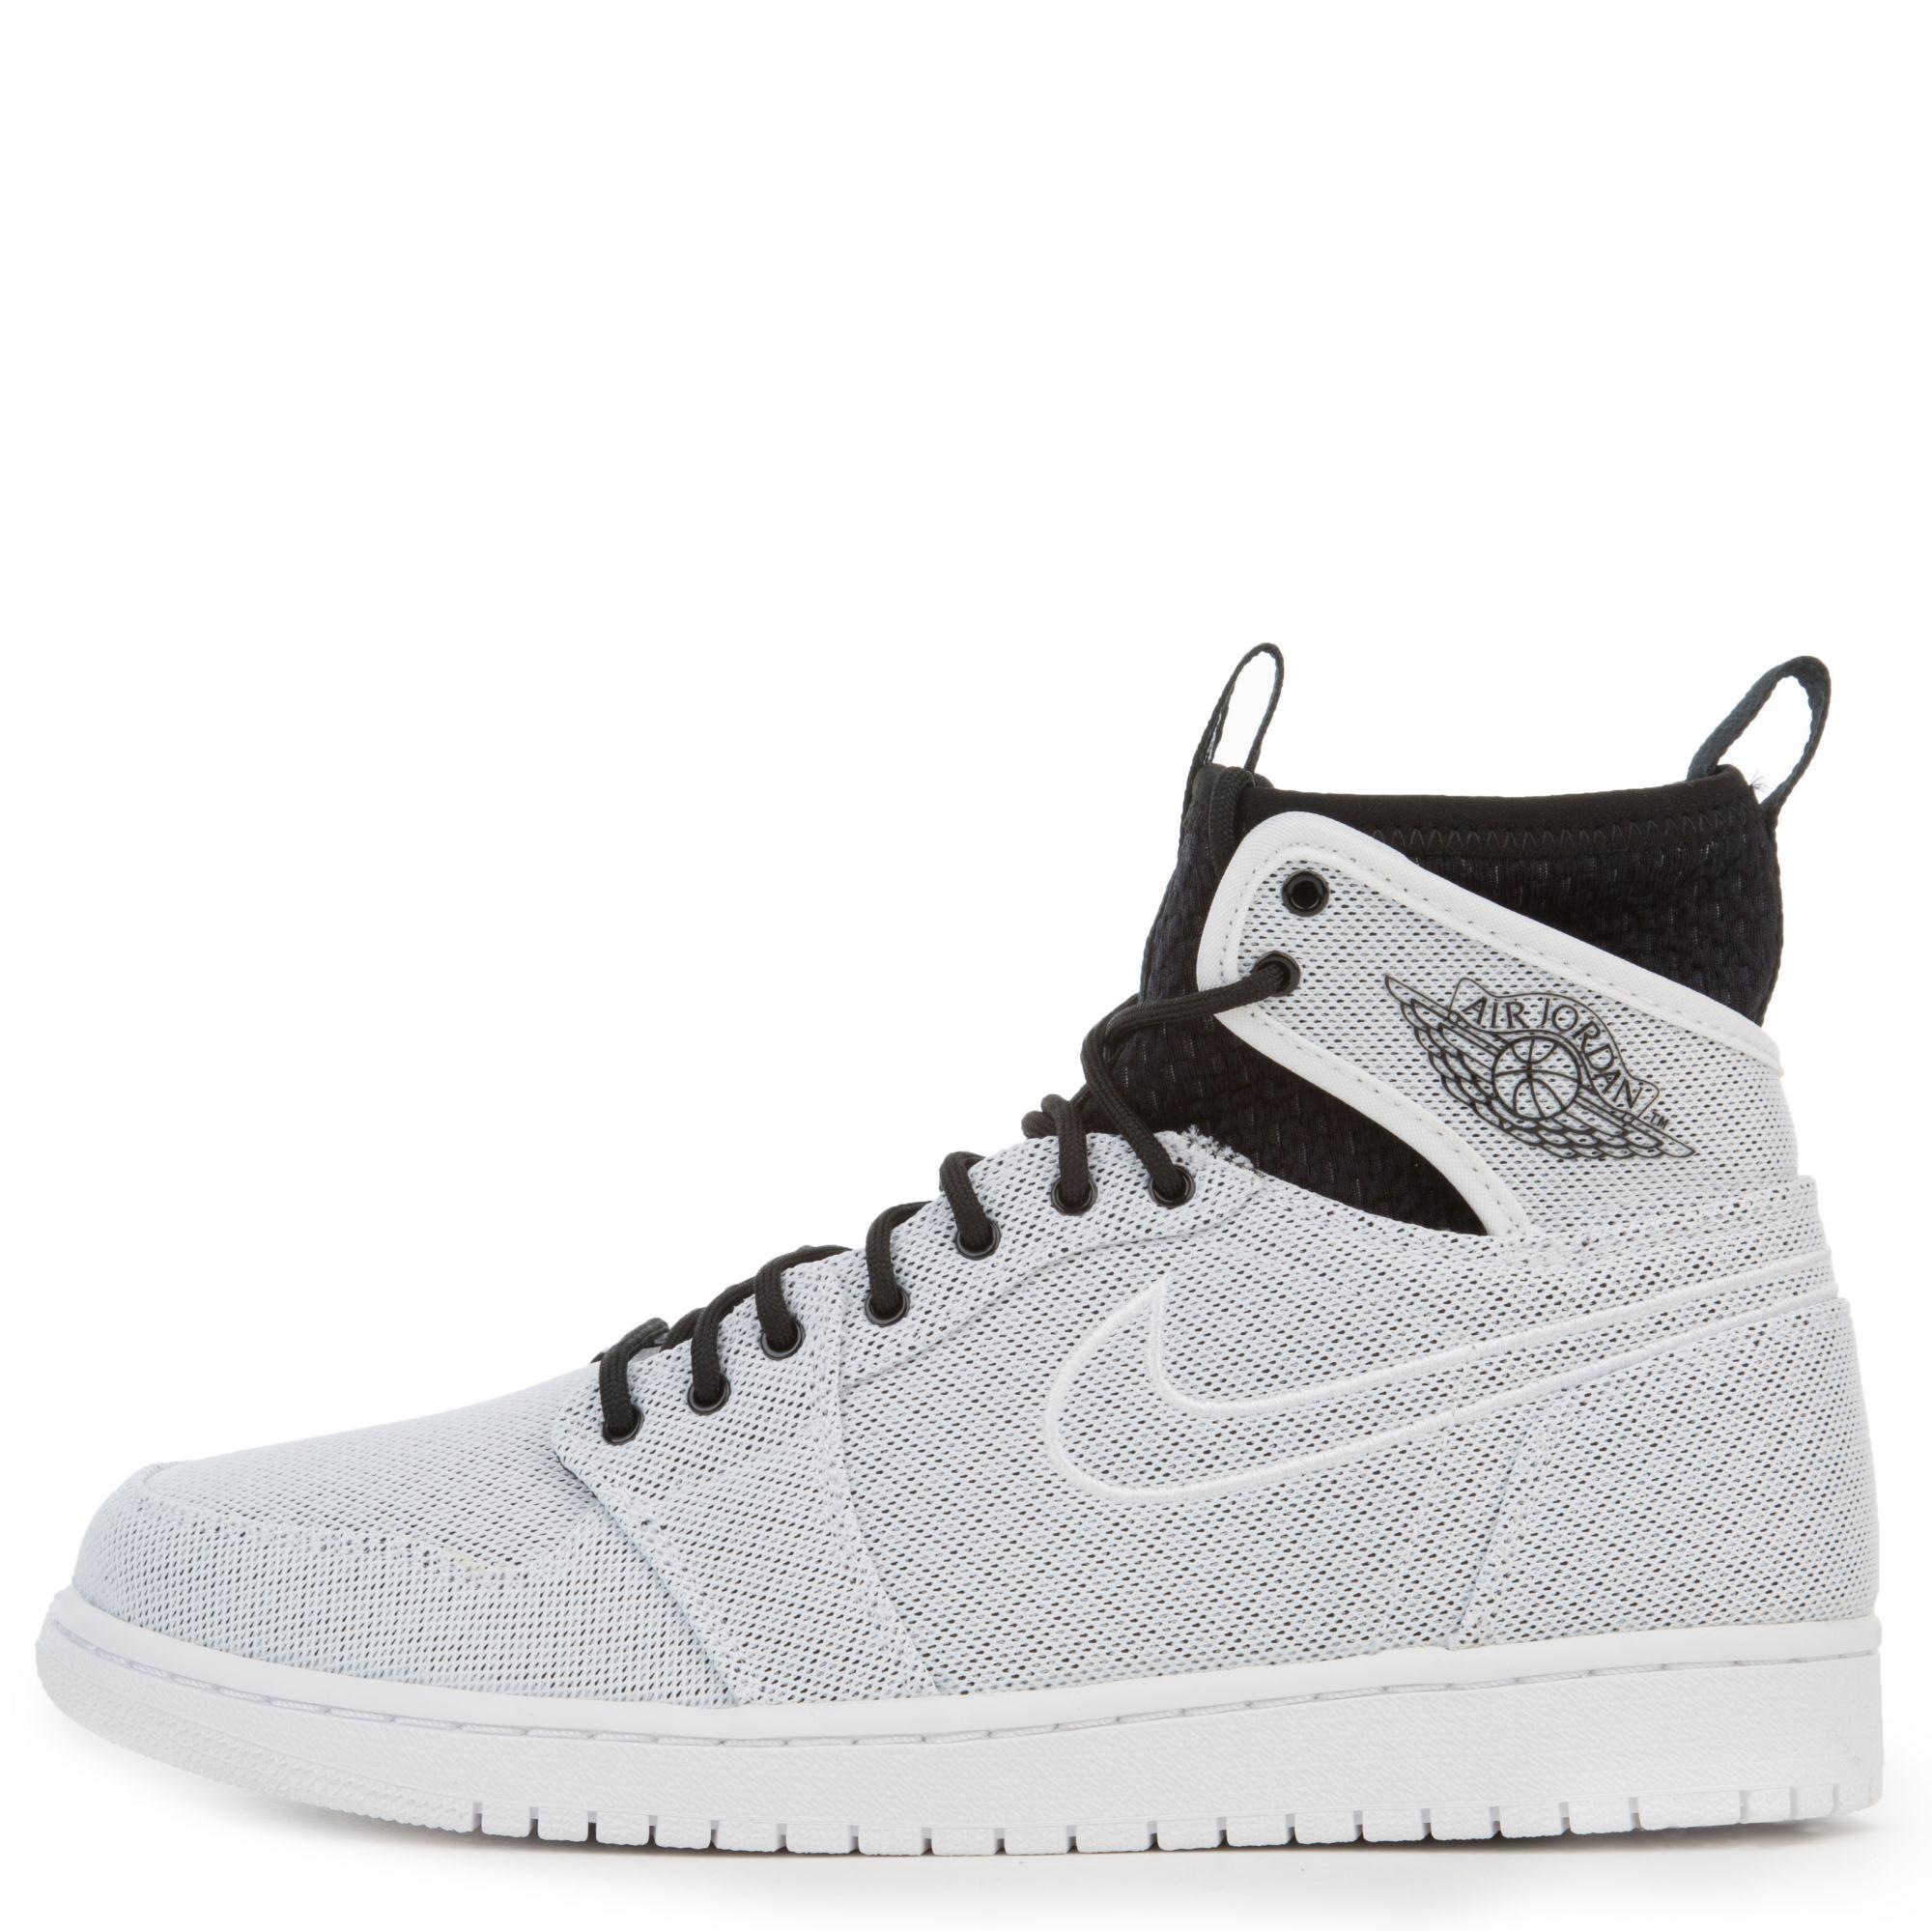 new lifestyle clearance sale autumn shoes Air Jordan 1 Retro Ultra High WHITE/MTLC GOLD COIN-BLACK-PURE PLATINUM